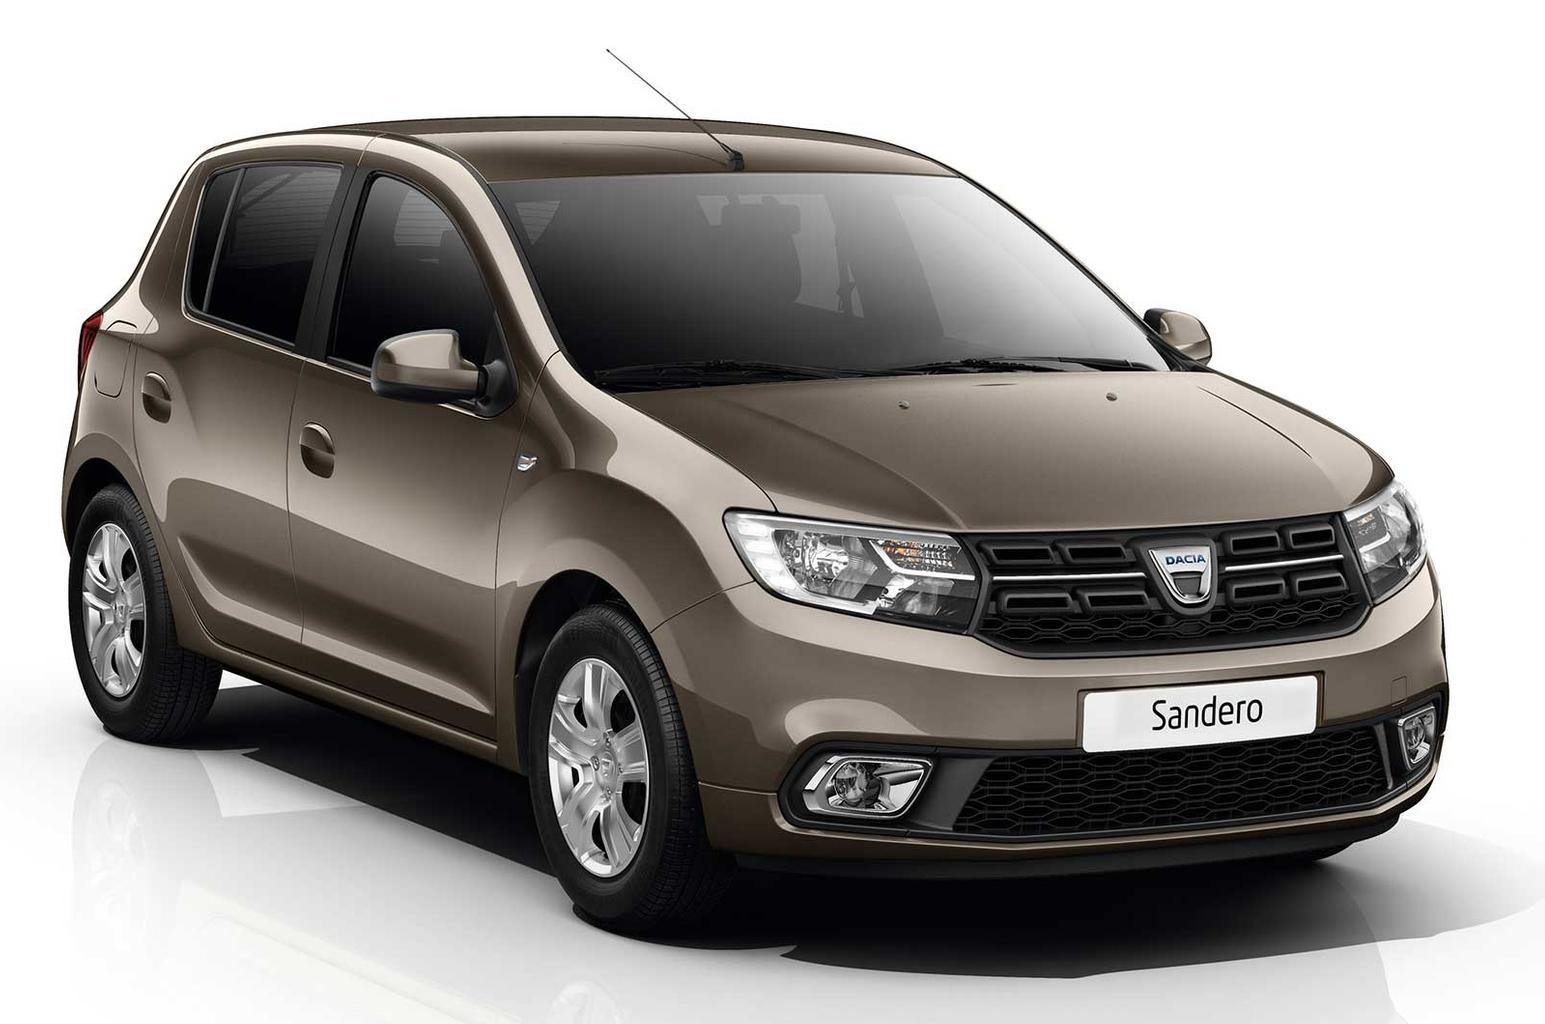 Facelifted Dacia Sandero, Sandero Stepway and Logan MCV prices announced